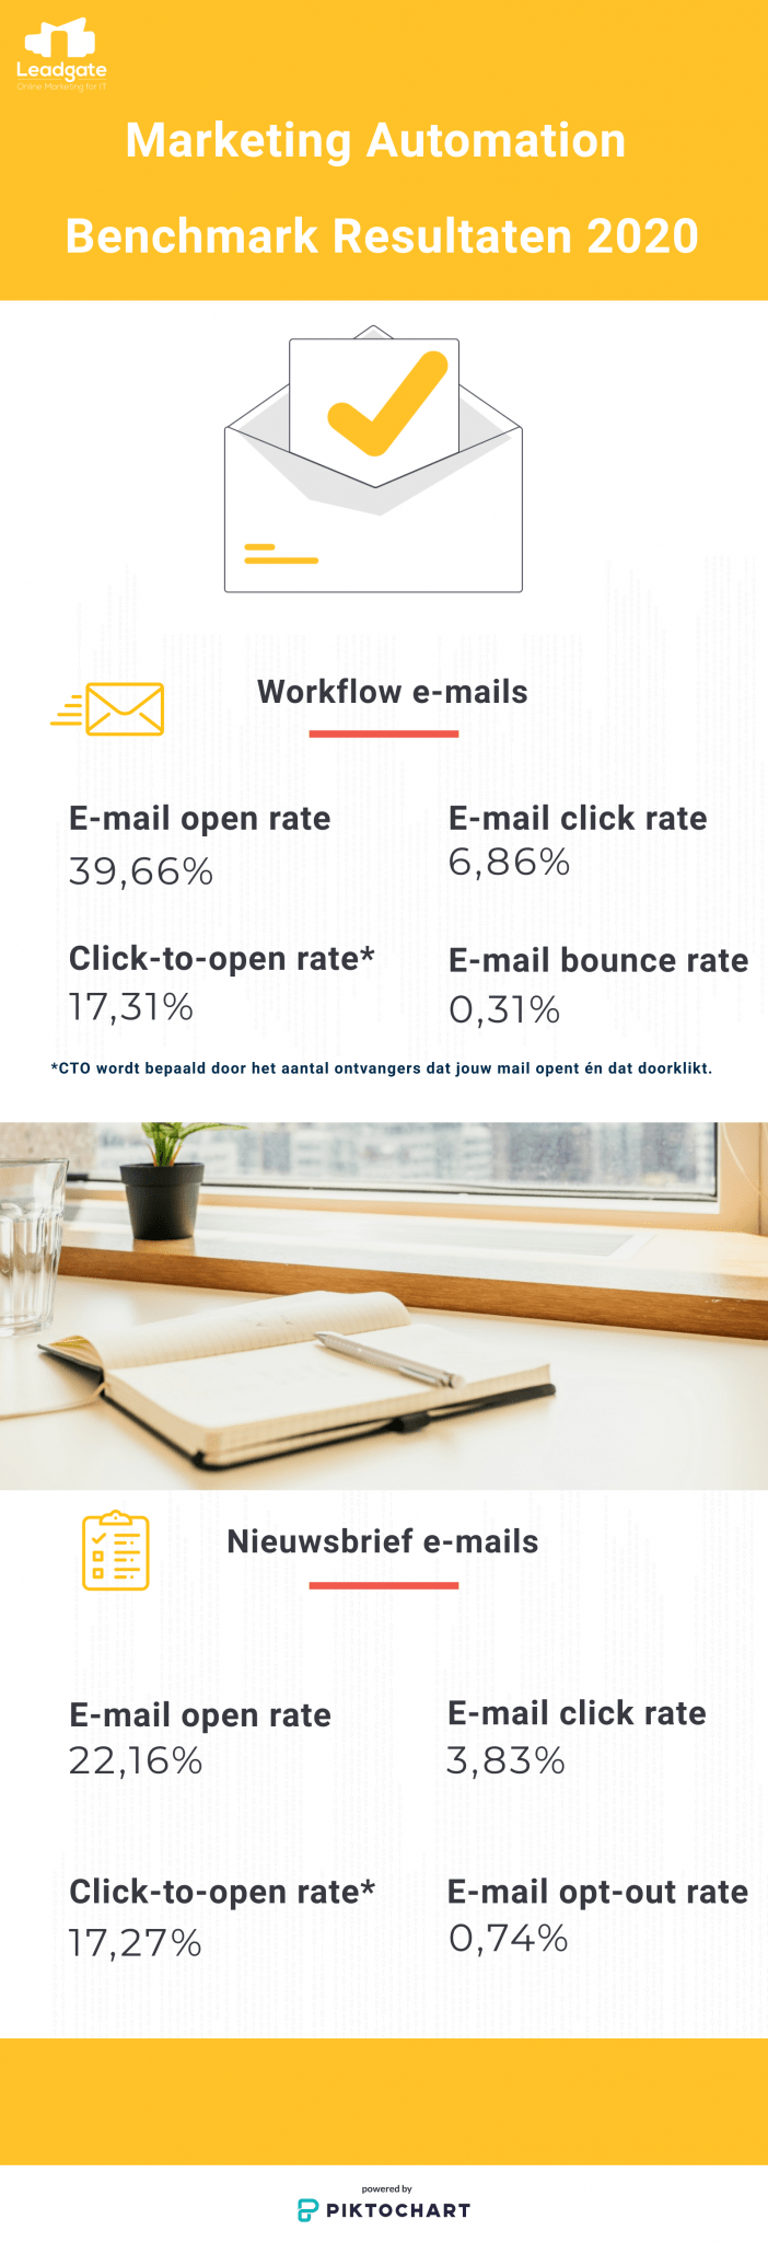 Infographic Marketing Automation Resultaten 2020